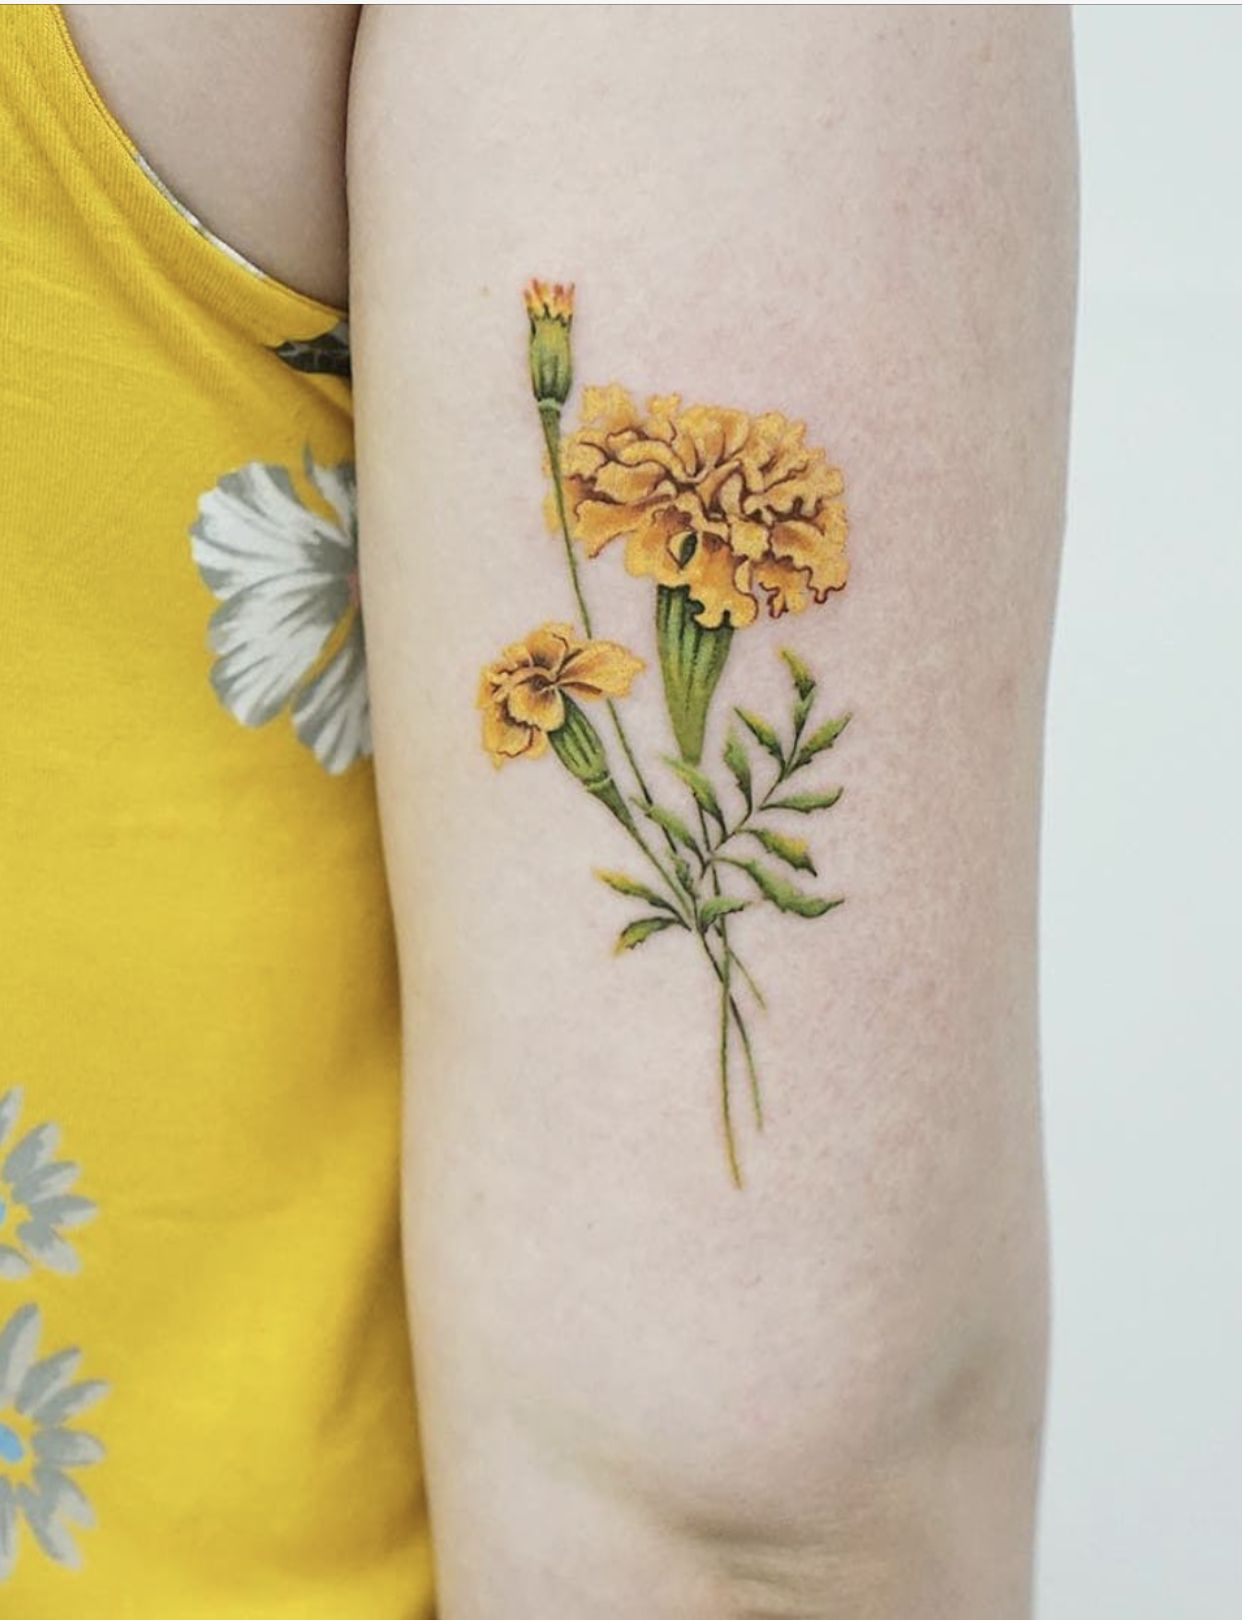 Pin by Melissa Alcott on Inkspiration in 2020 Marigold